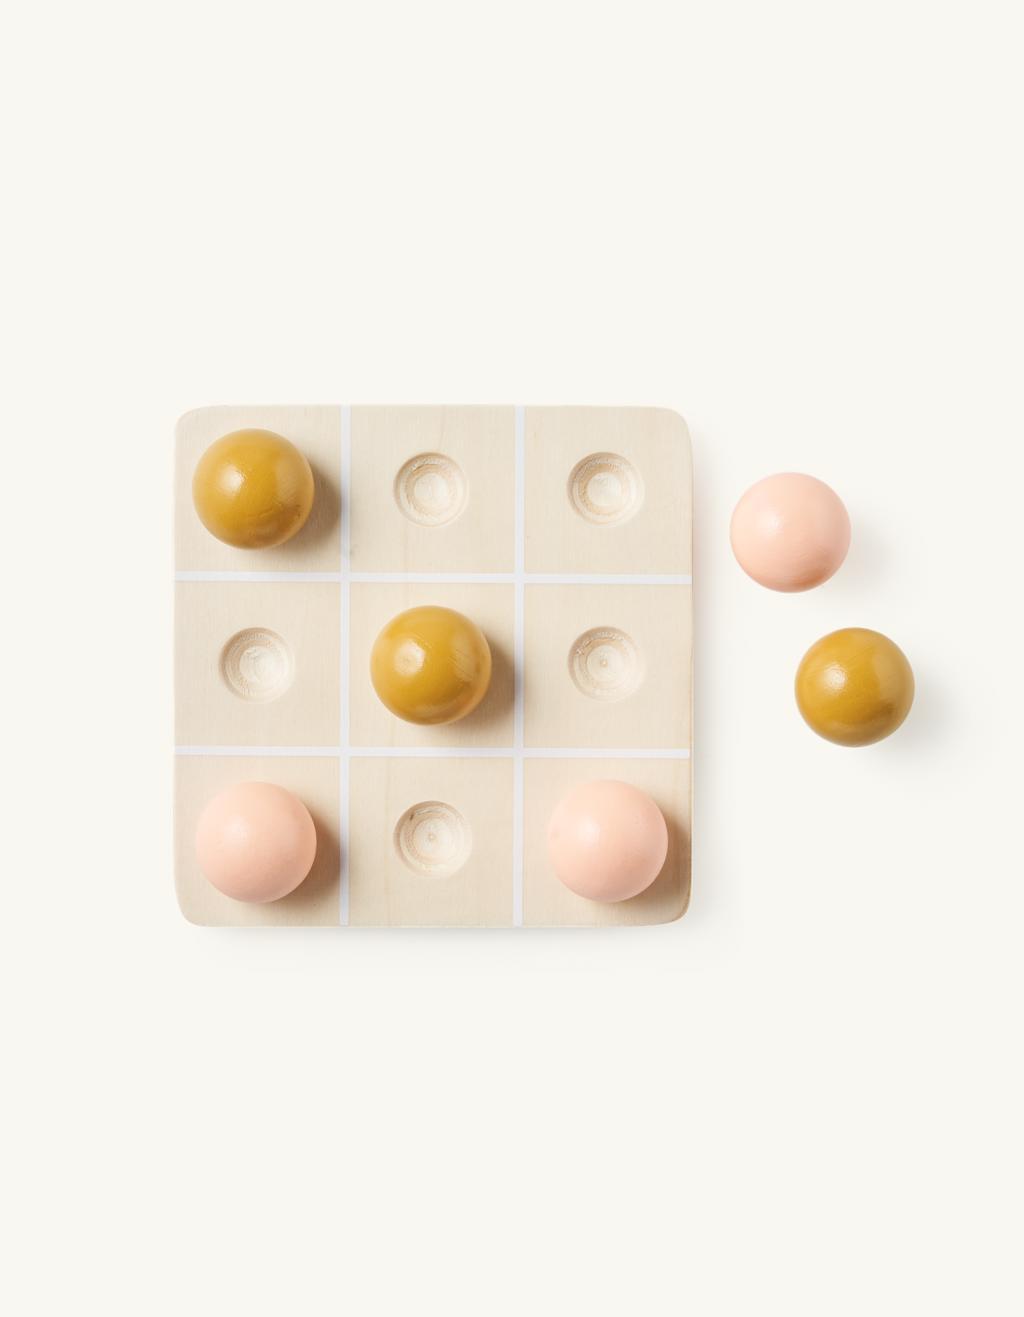 Boter kaas en eieren spel